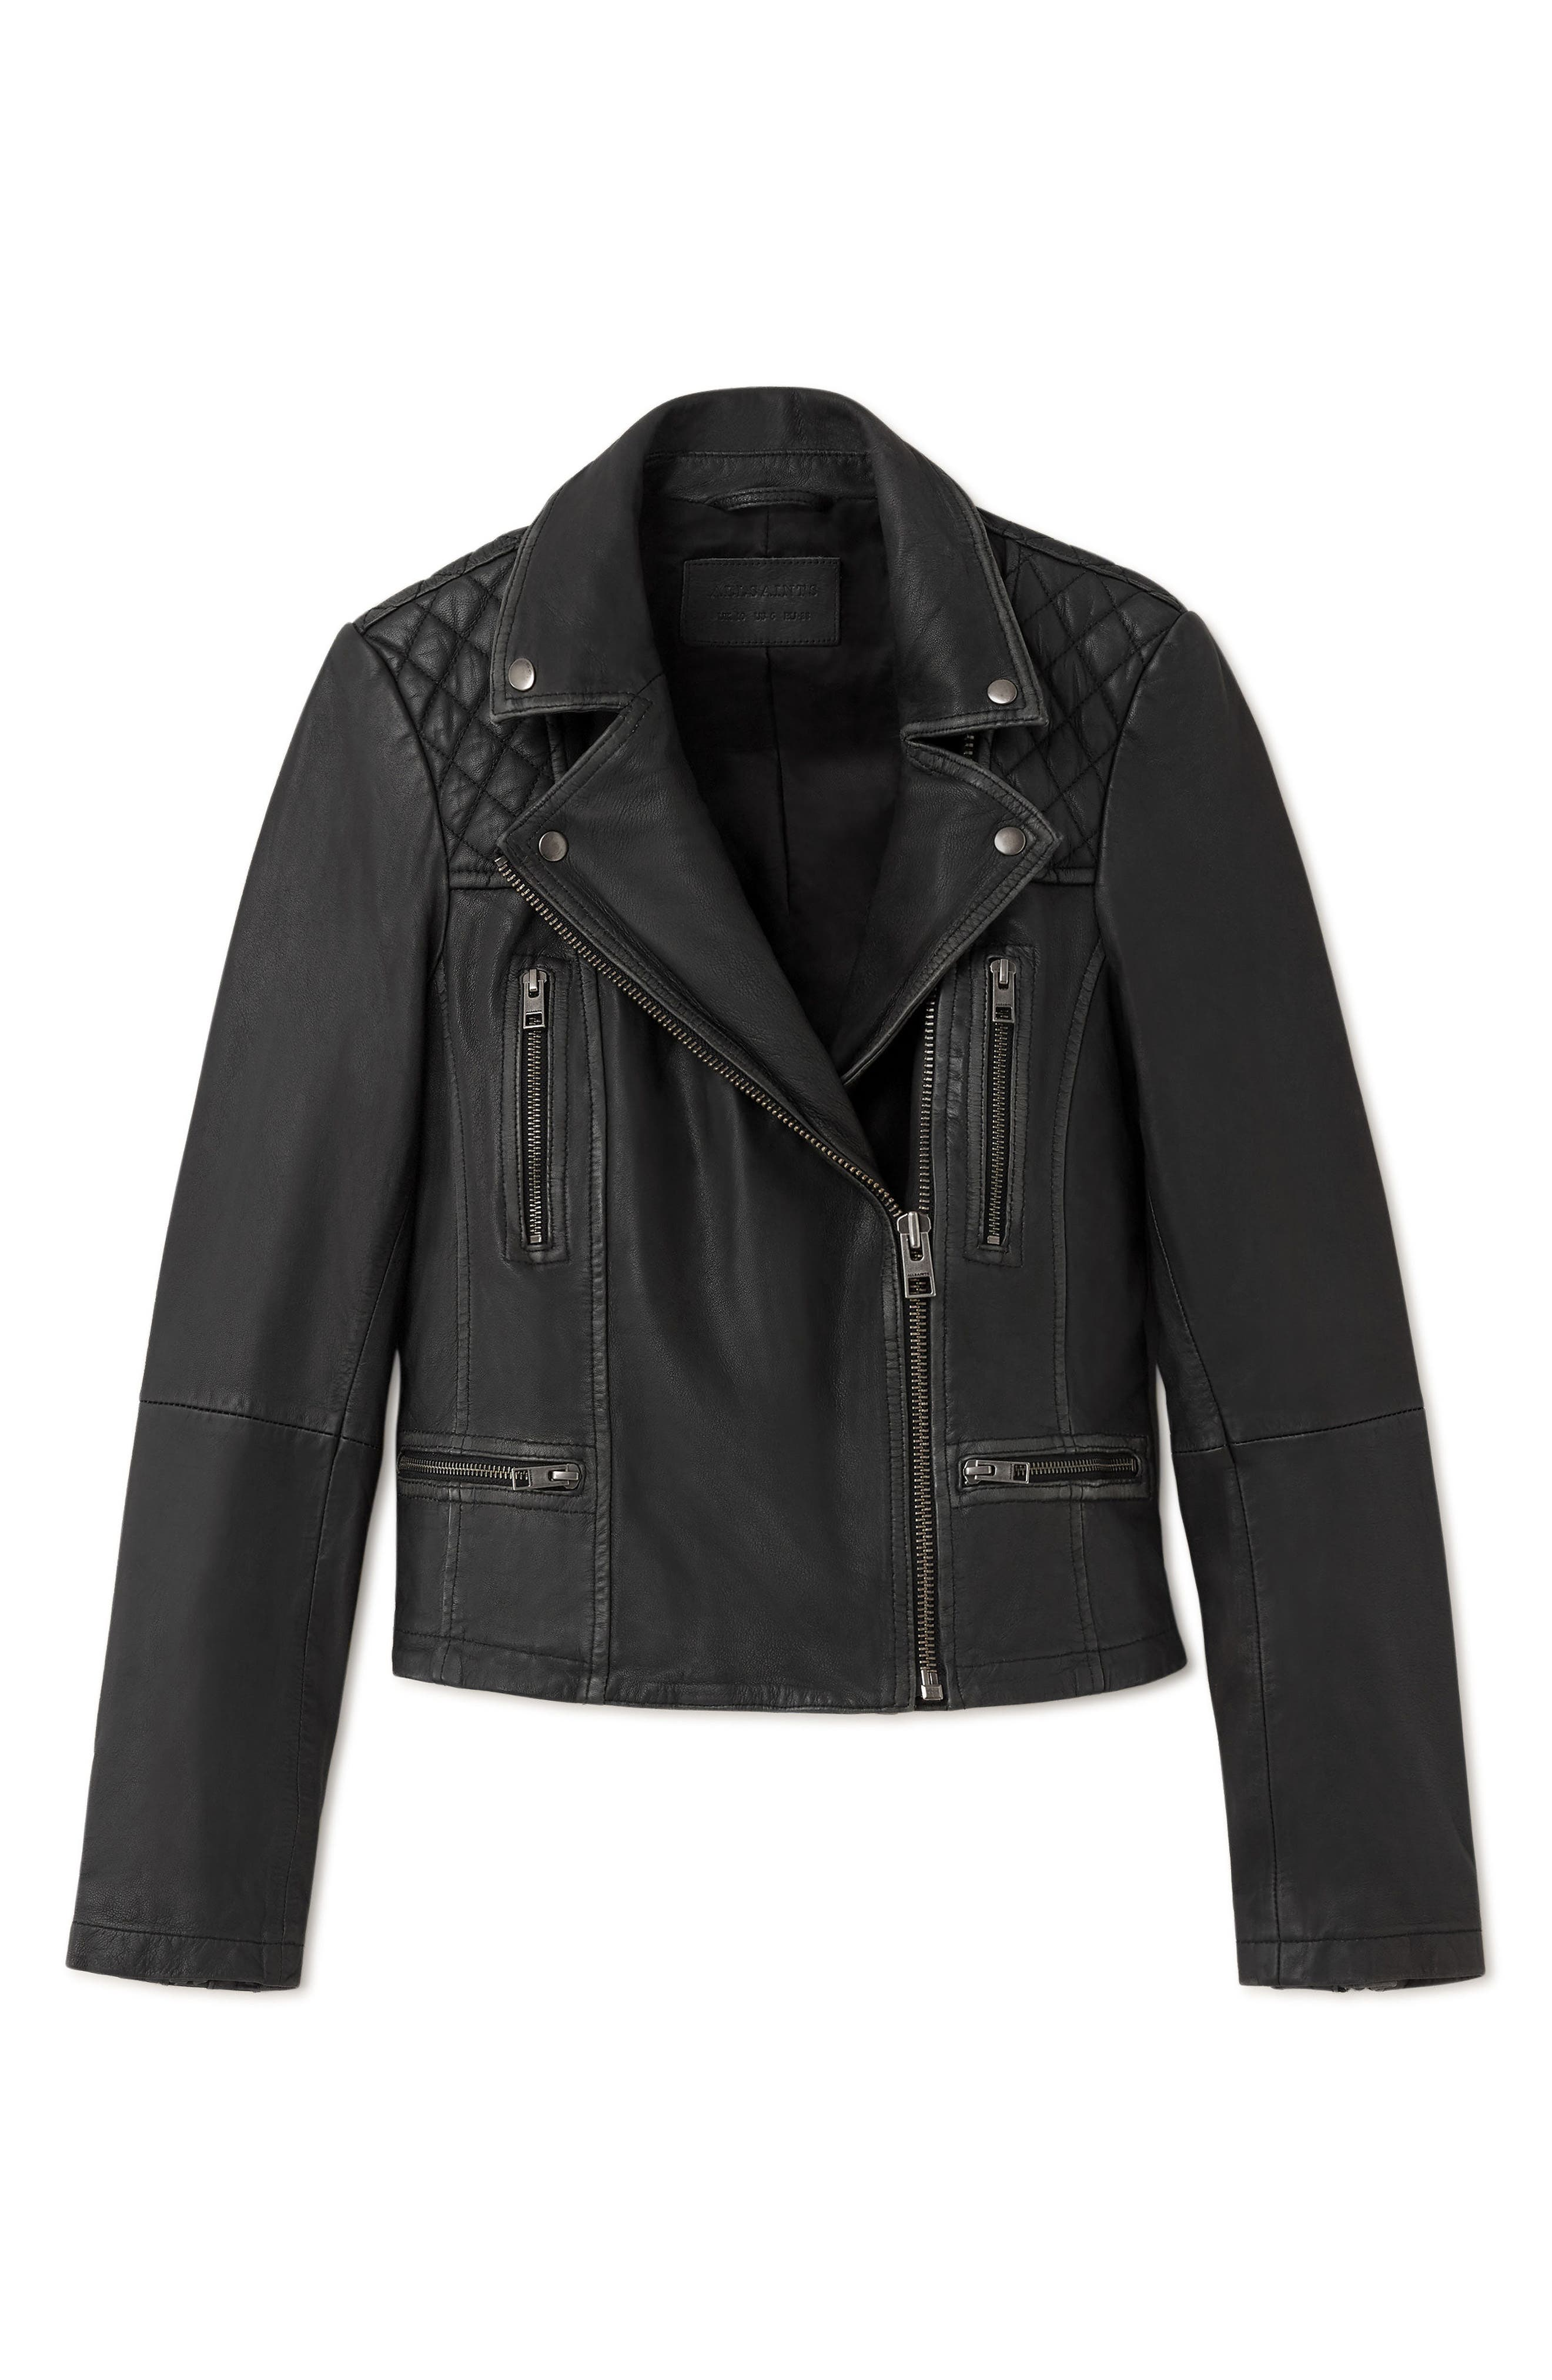 ALLSAINTS, Cargo Biker Slim Fit Leather Jacket, Alternate thumbnail 5, color, BLACK GREY